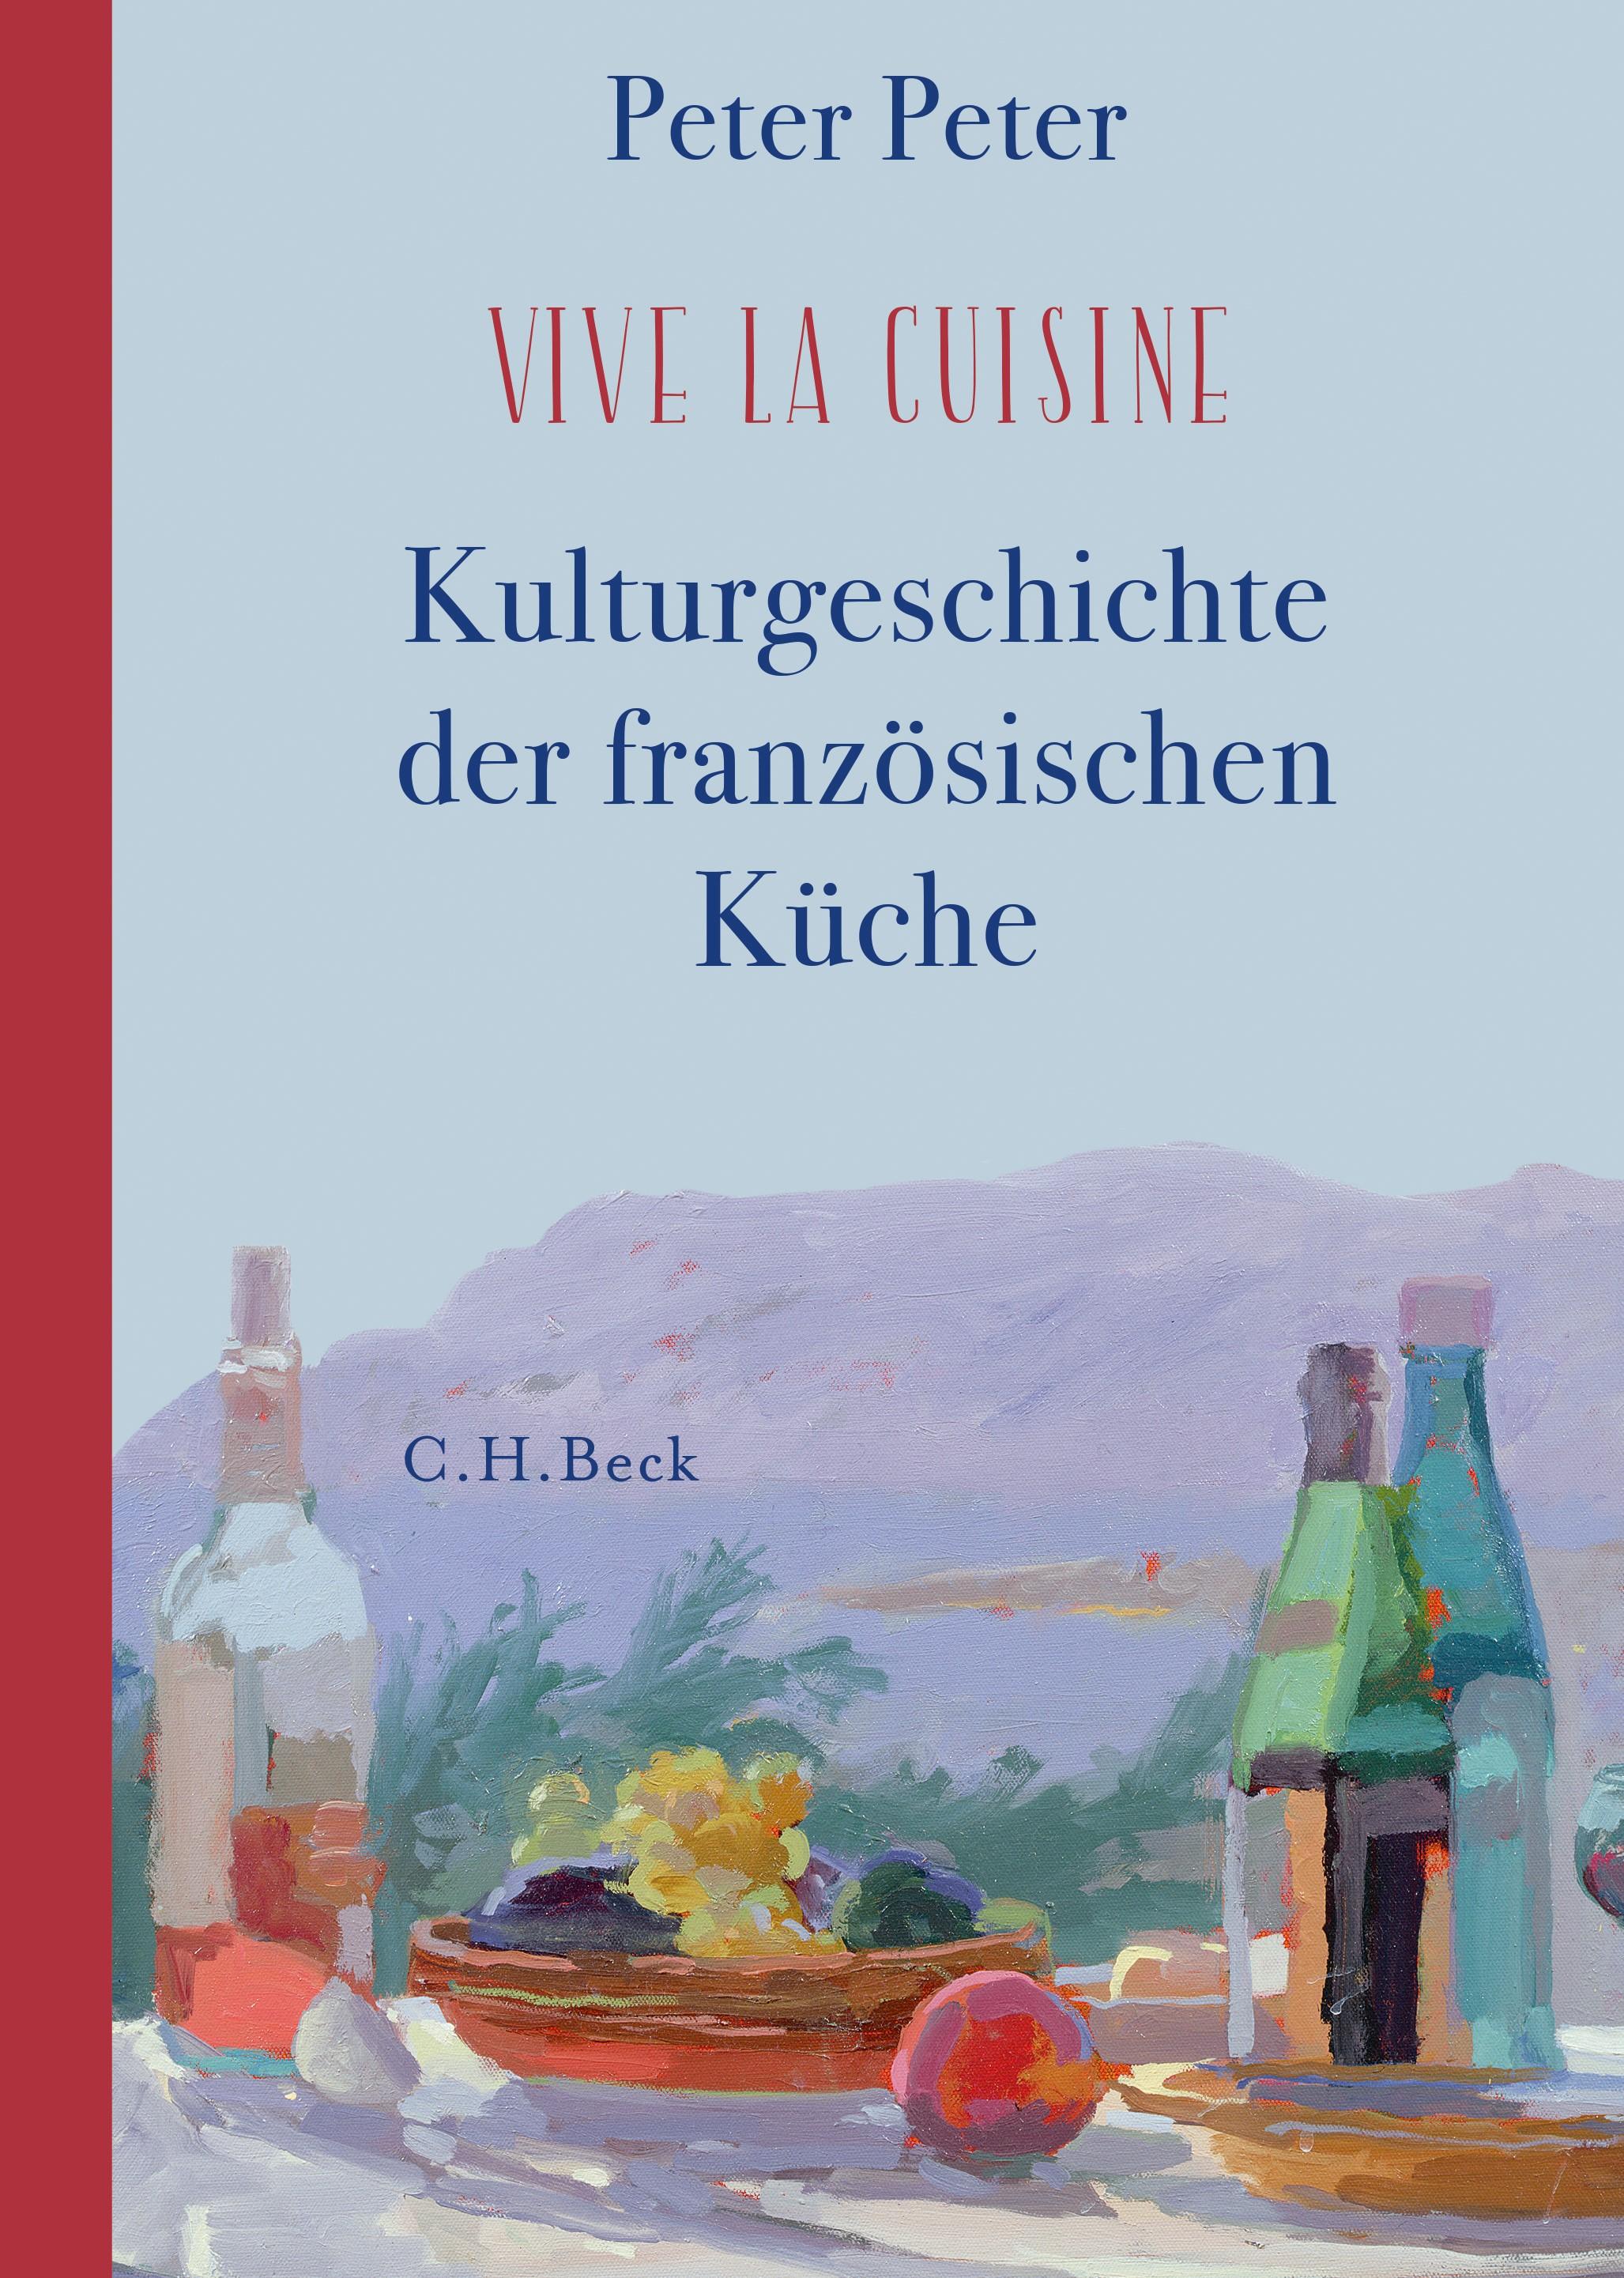 Abbildung von Peter, Peter | Vive la cuisine! | 2019